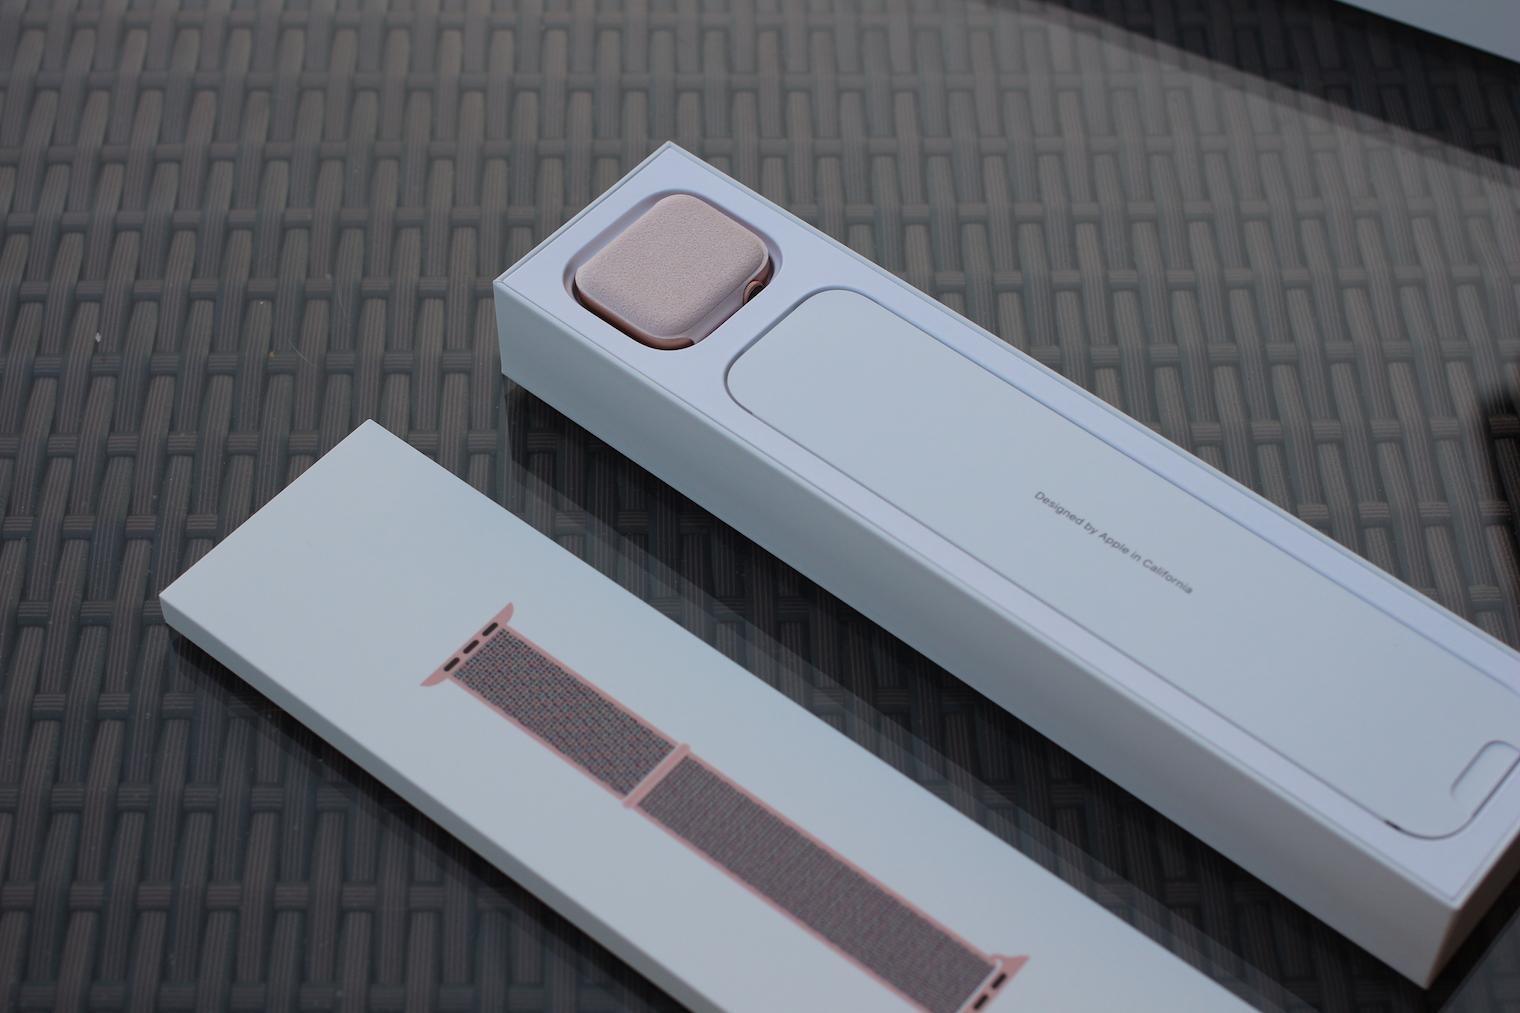 Apple watch series 4 box